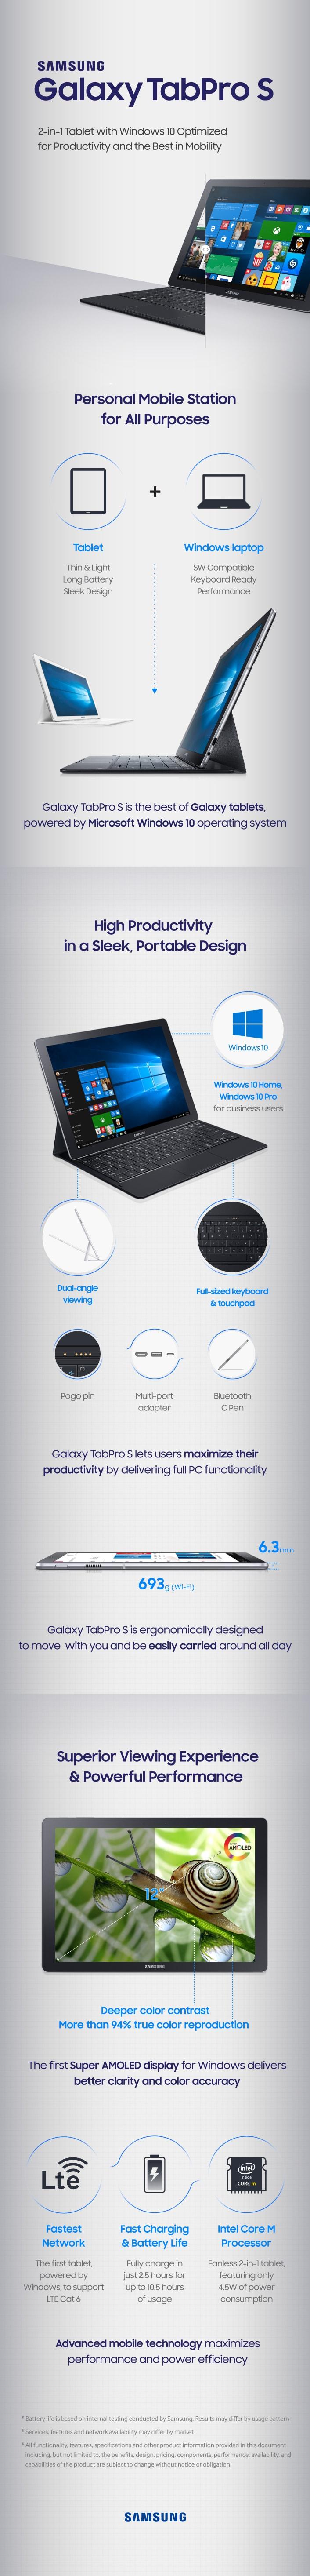 tab-pro-s-infographic